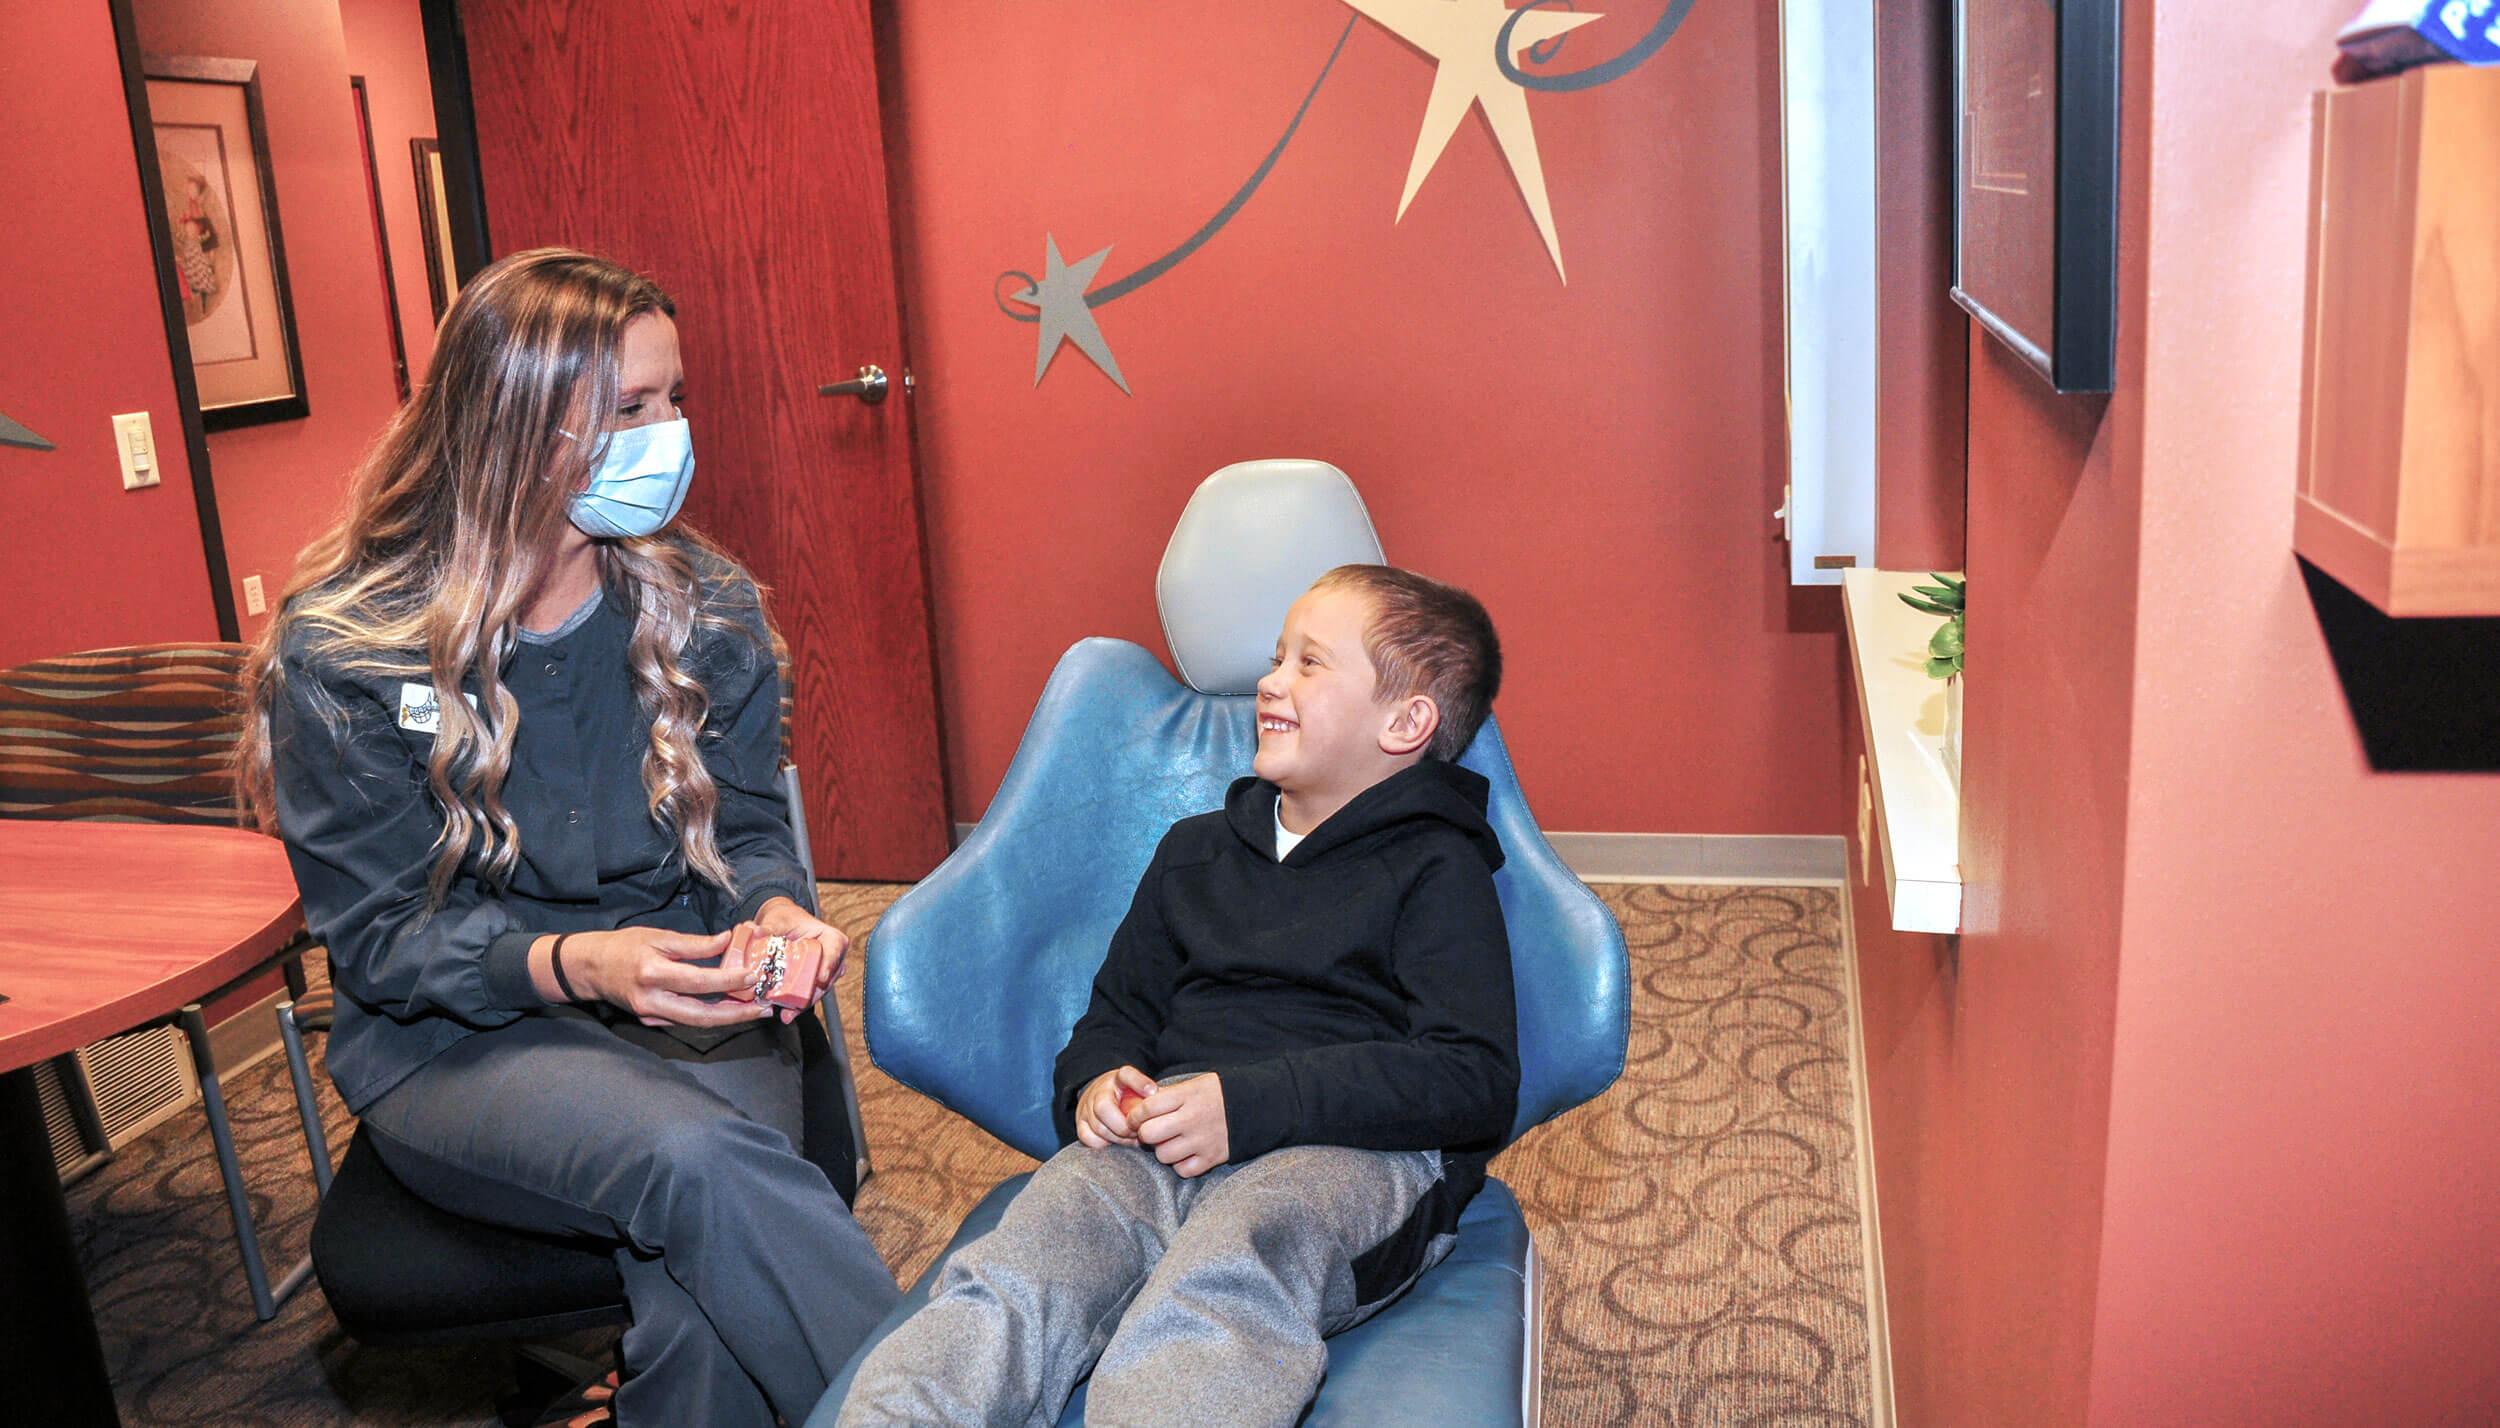 Dental hygienist showing a smiling child a dental mold